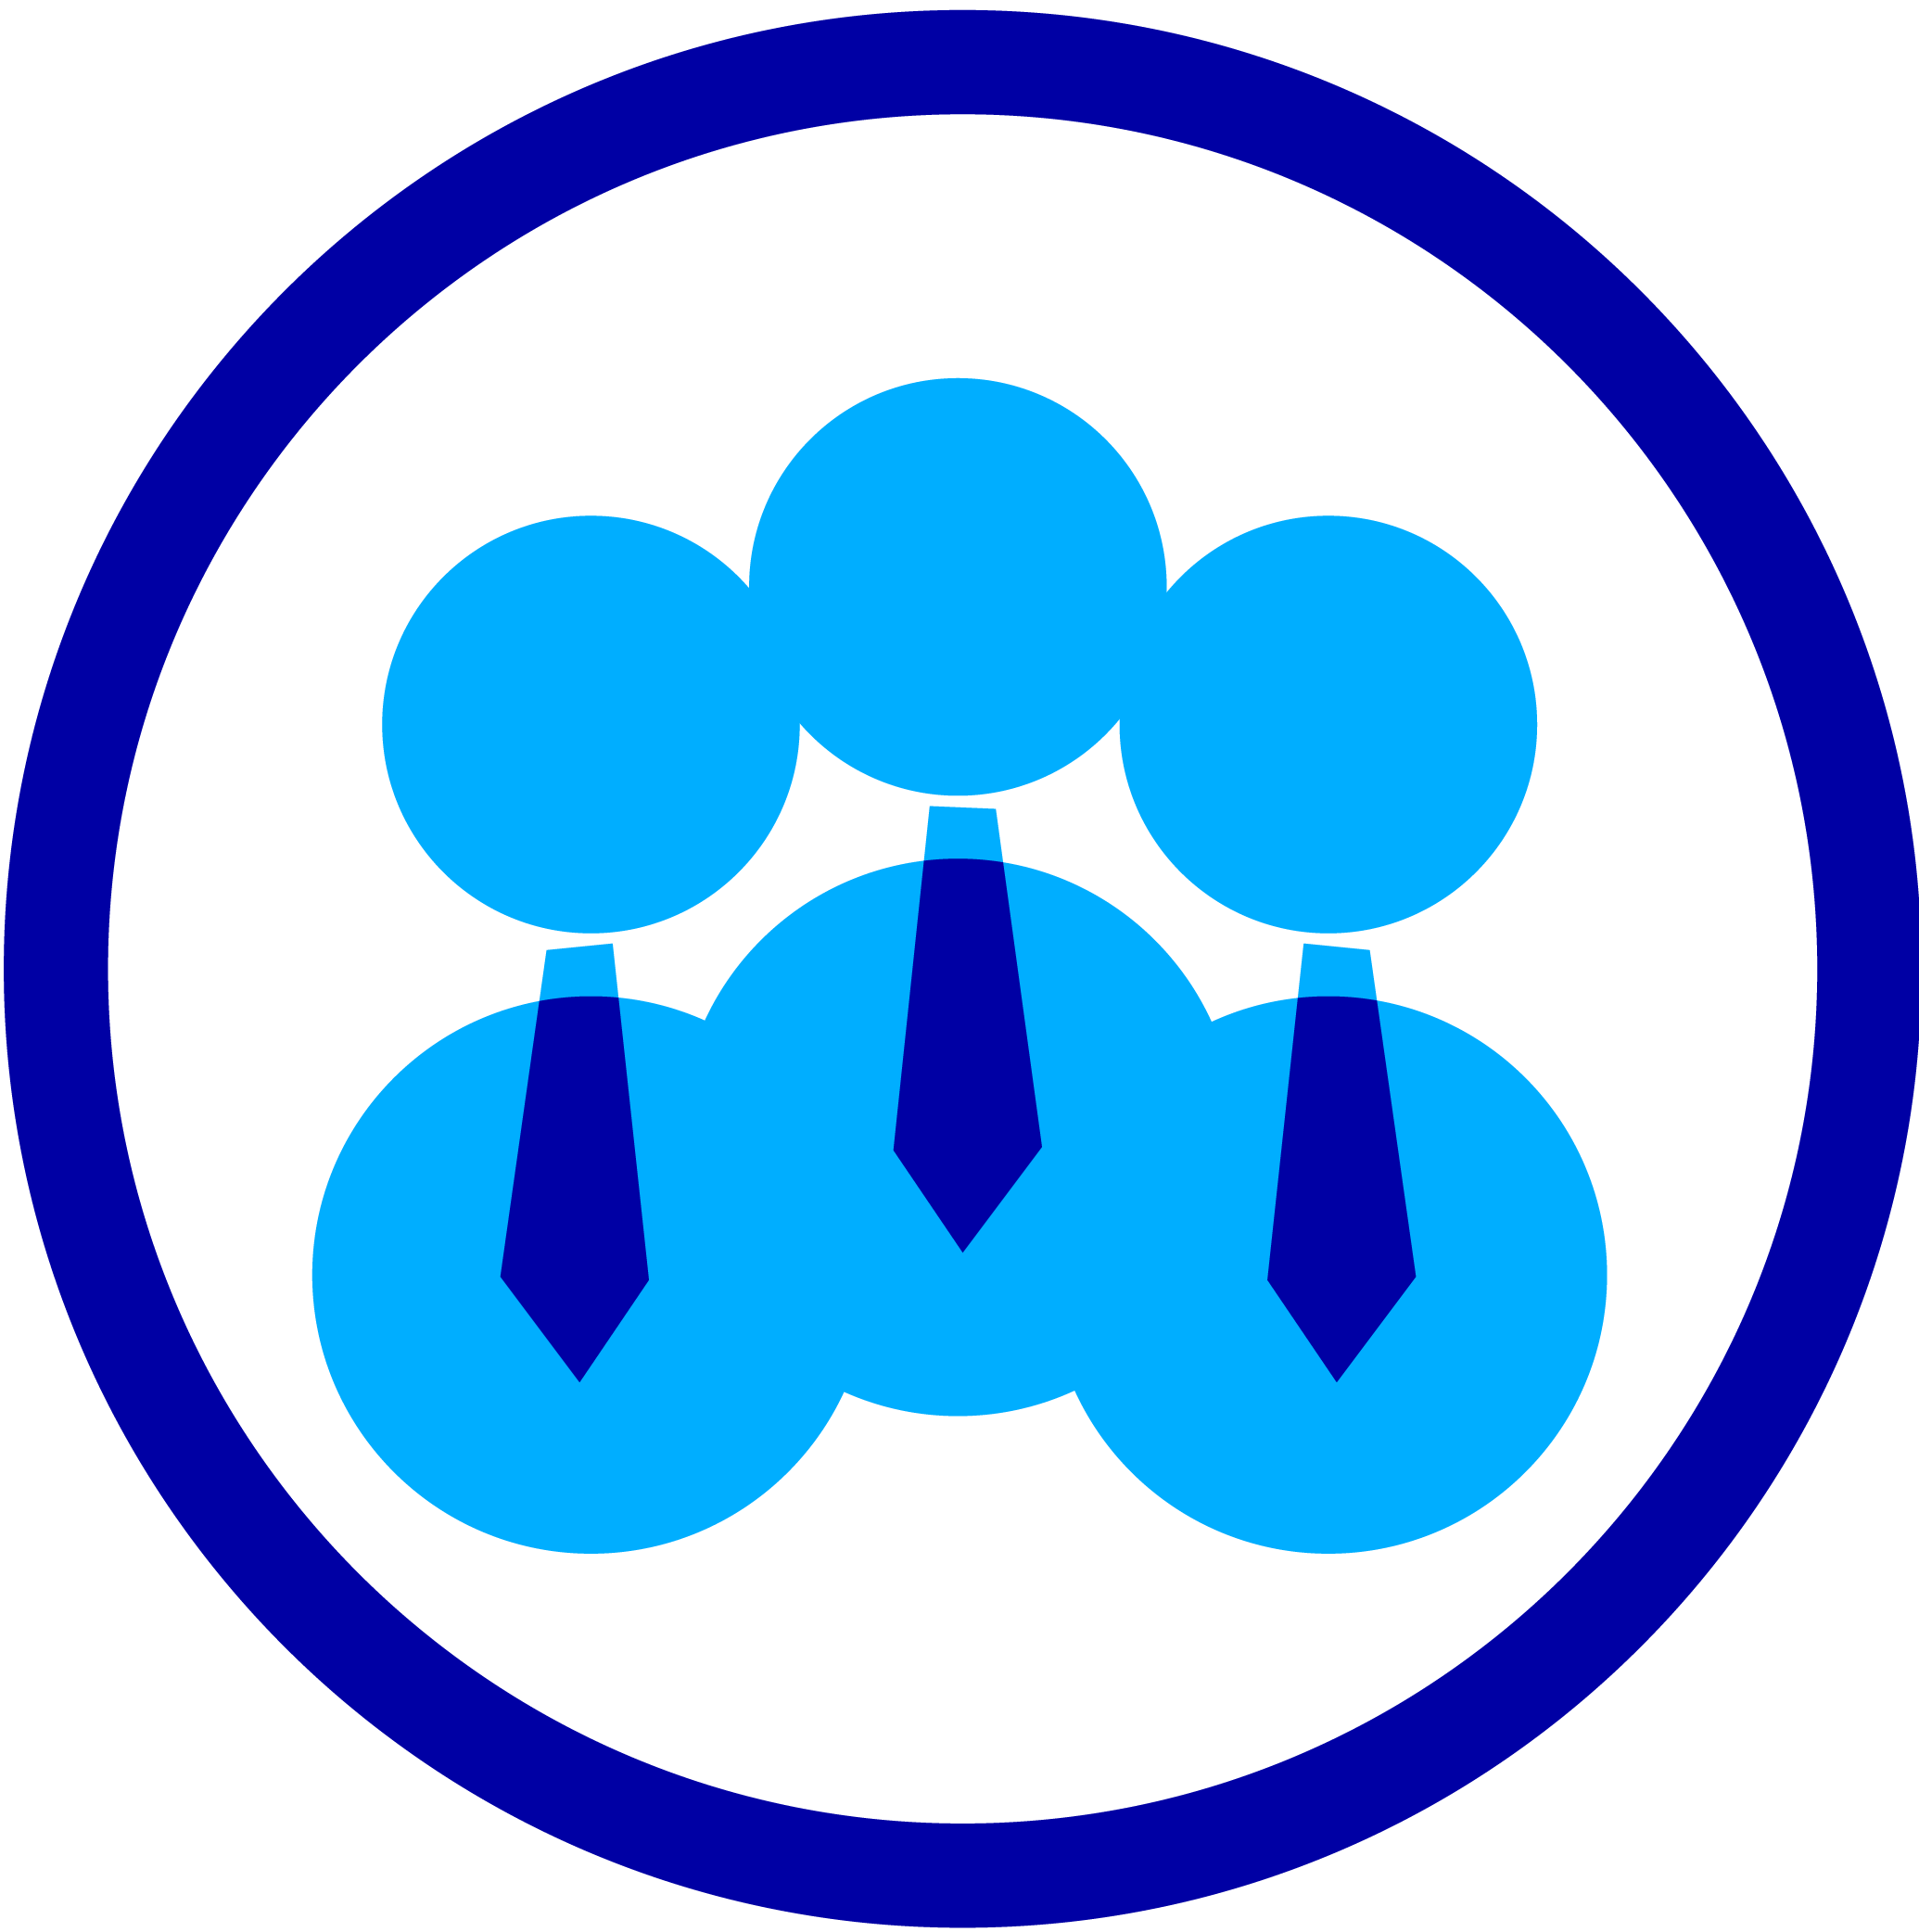 https://co.fi-group.com/wp-content/uploads/sites/14/2021/02/blue-icons-set_1-59.png